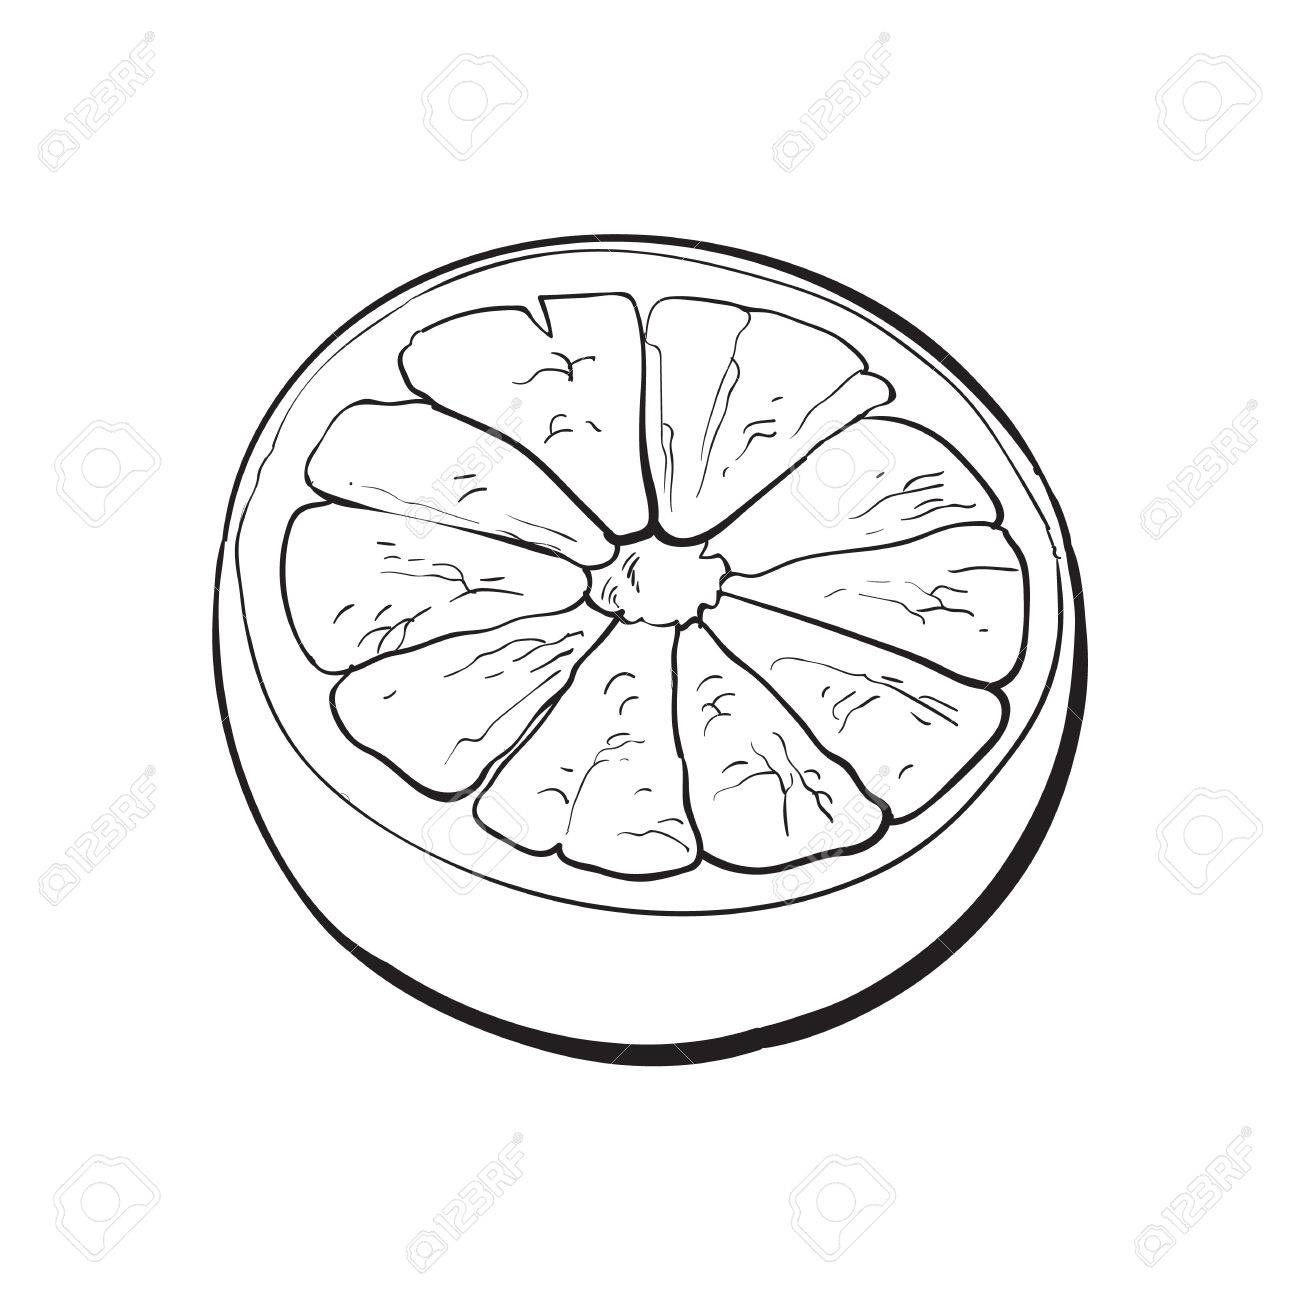 1300x1300 Half Of Ripe Grapefruit, Orange, Hand Drawn Black And White Sketch